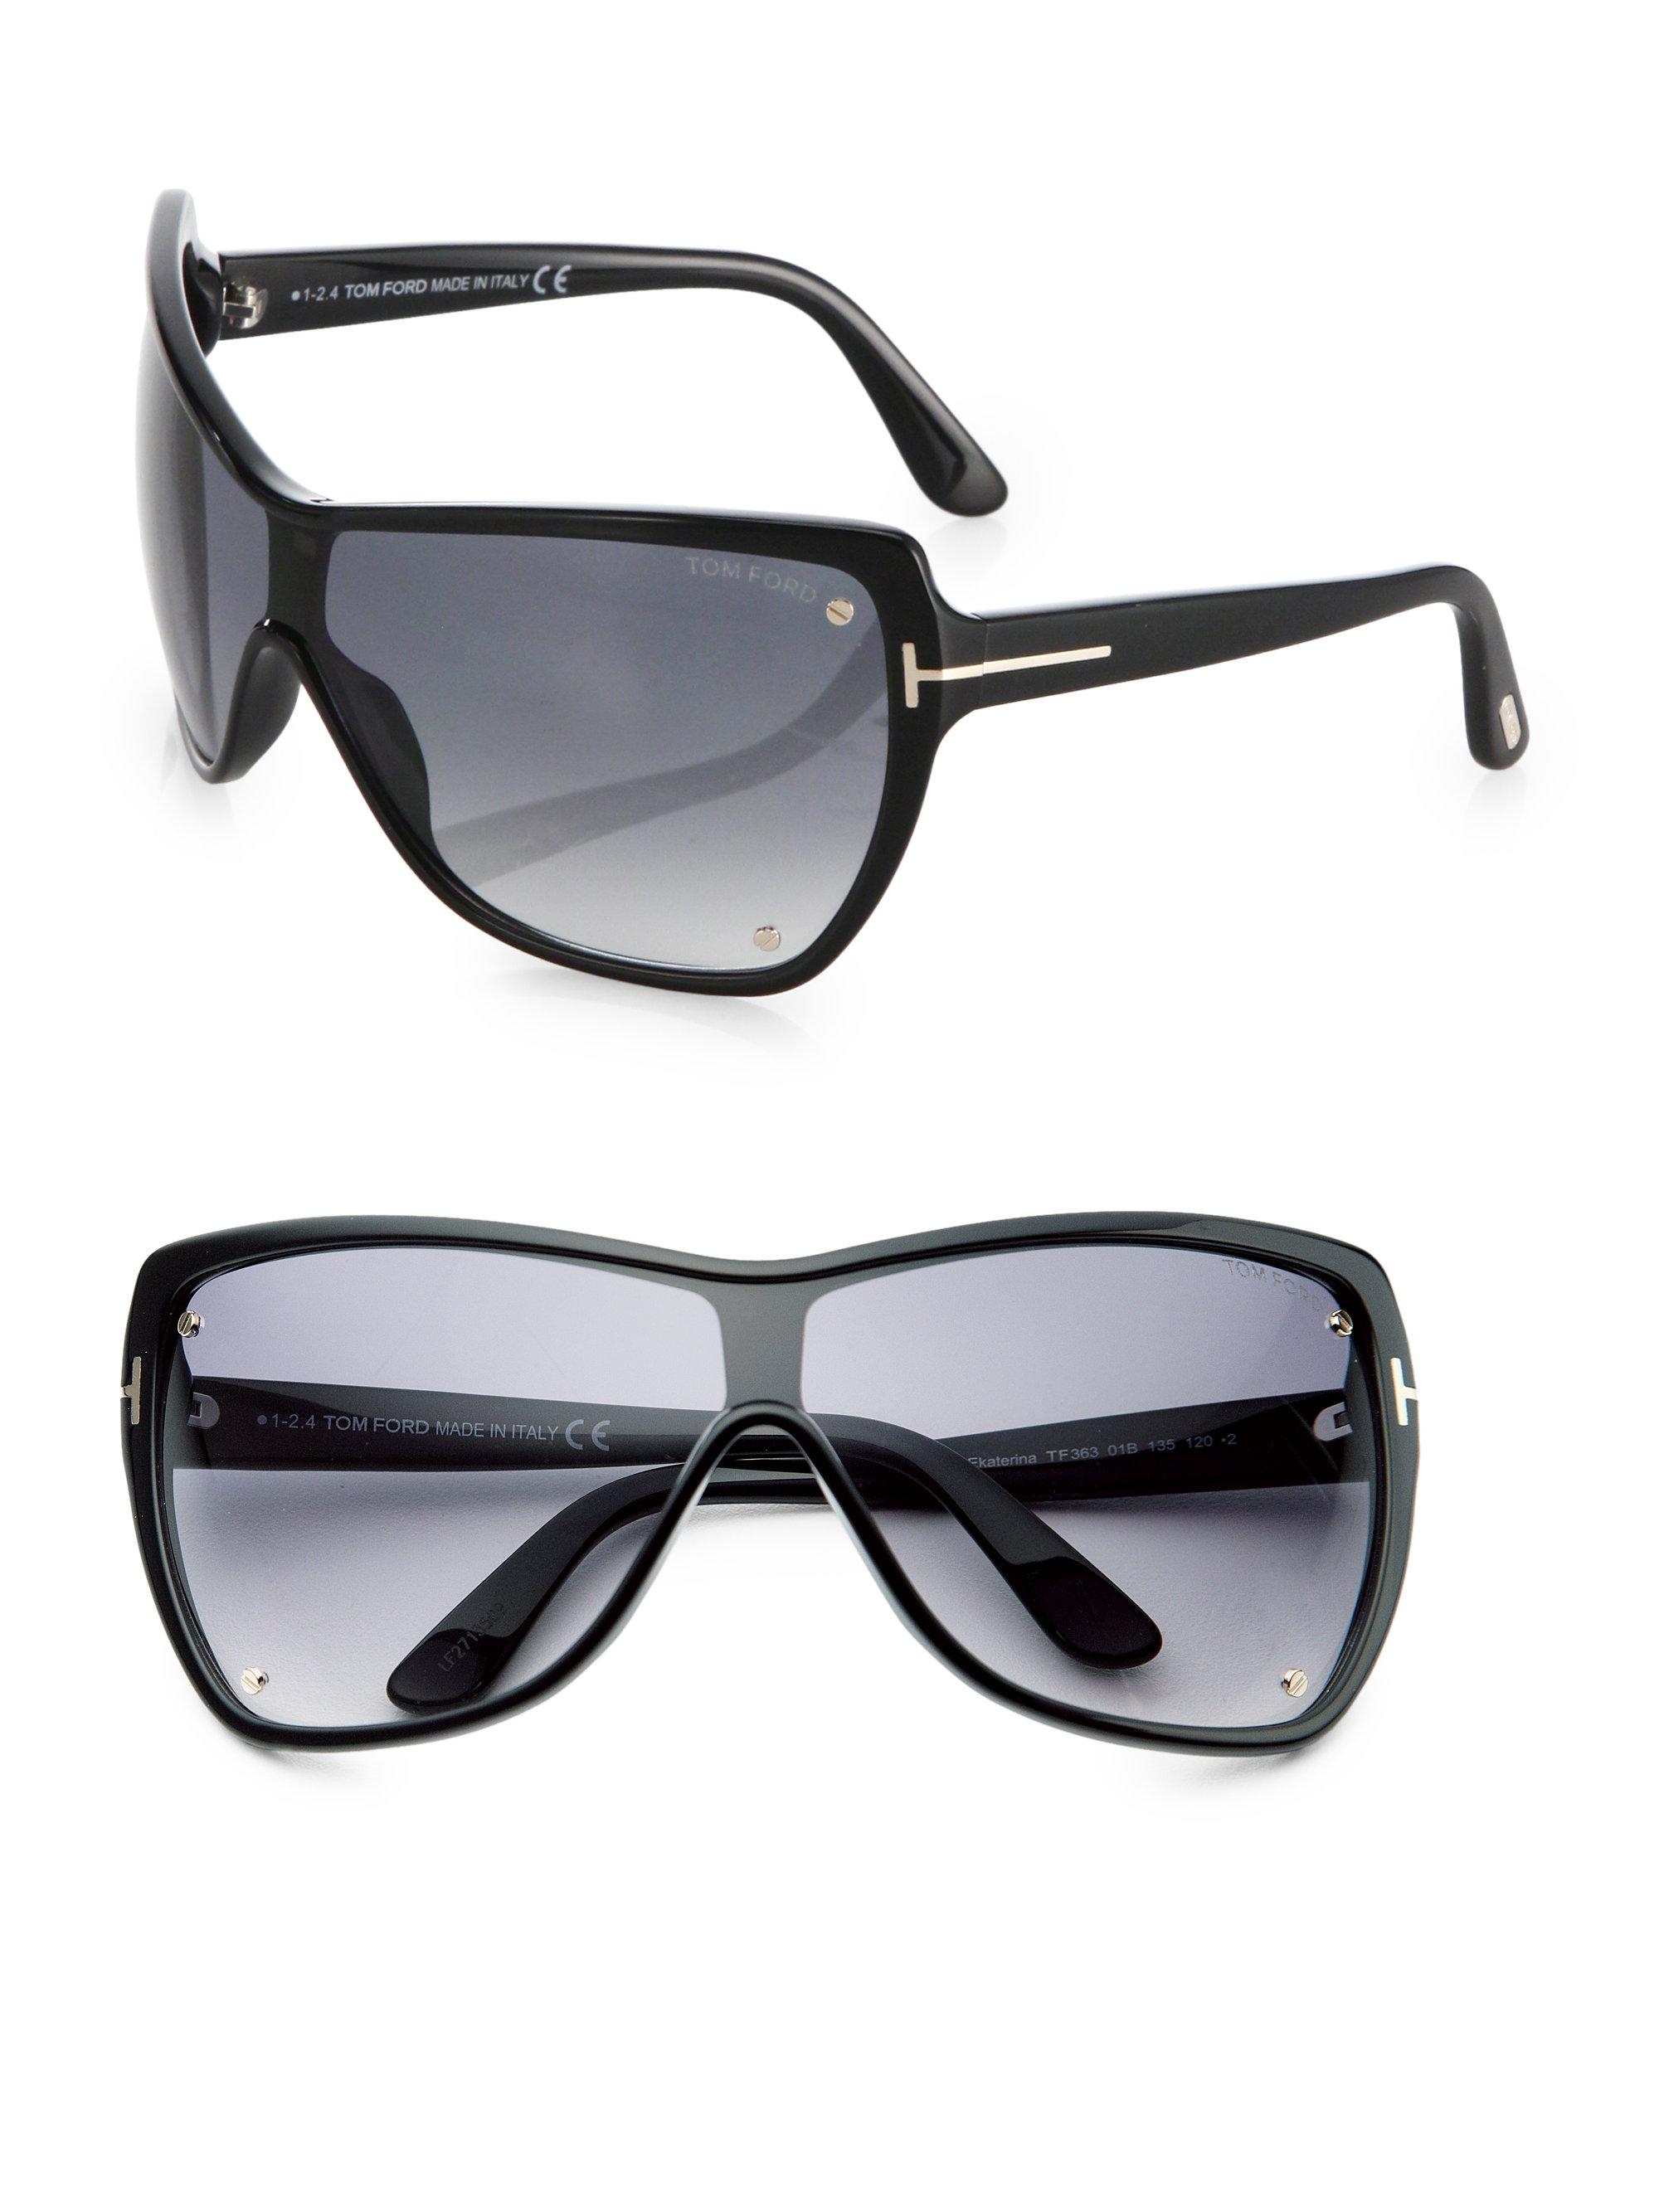 a63dd0d7b7e6 Shield Sunglasses Saks